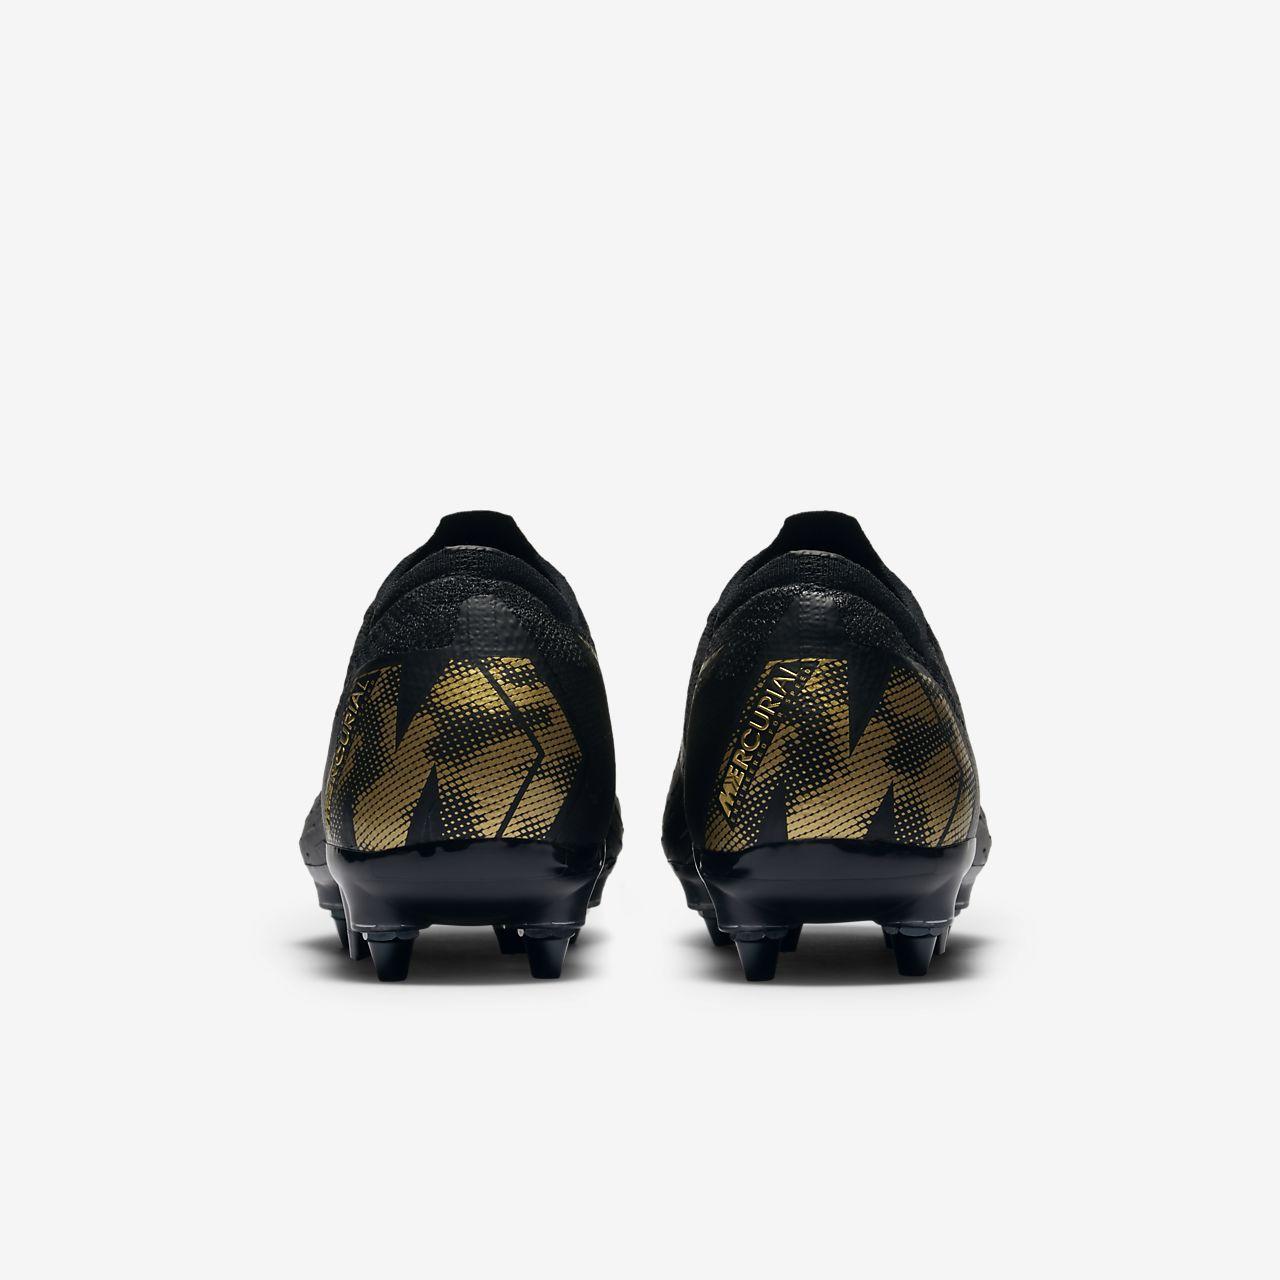 the best attitude 5423b b5404 ... Nike Mercurial Vapor 360 Elite SG-PRO Anti-Clog-fodboldstøvle (blødt  underlag